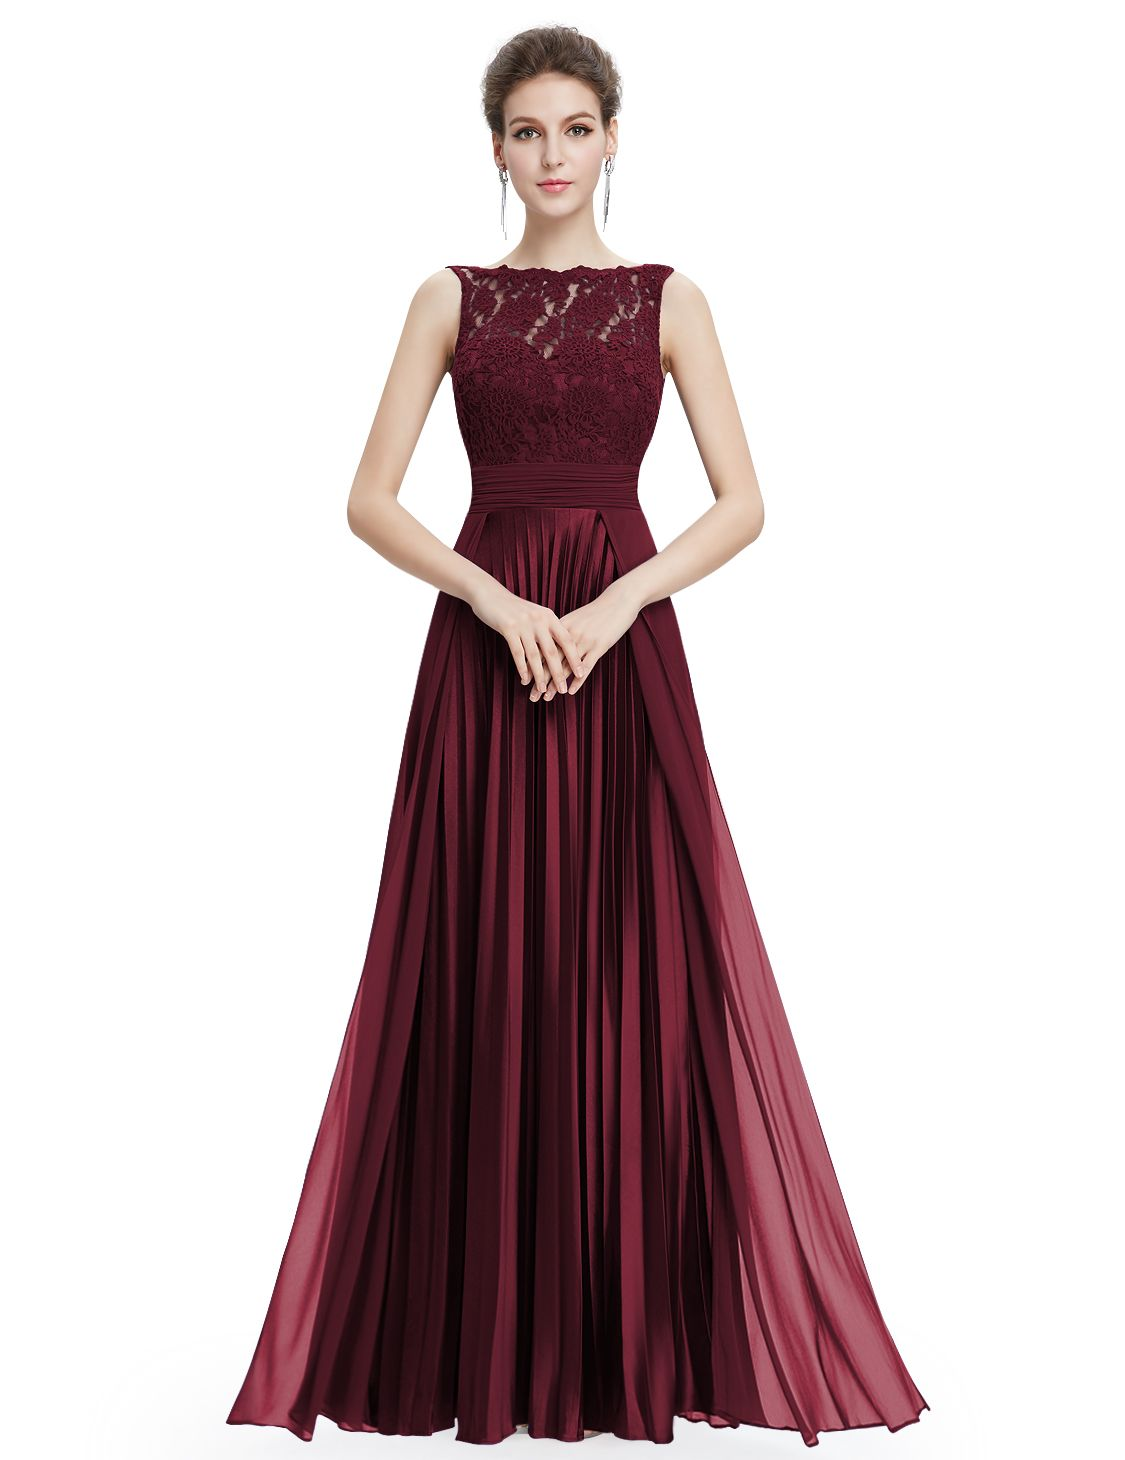 52f4a81bd18e24 Bordeaux rode galajurk Ruby shop je voordeling online bij I Love Dresses.  Eenvoudig besteld en snel geleverd!